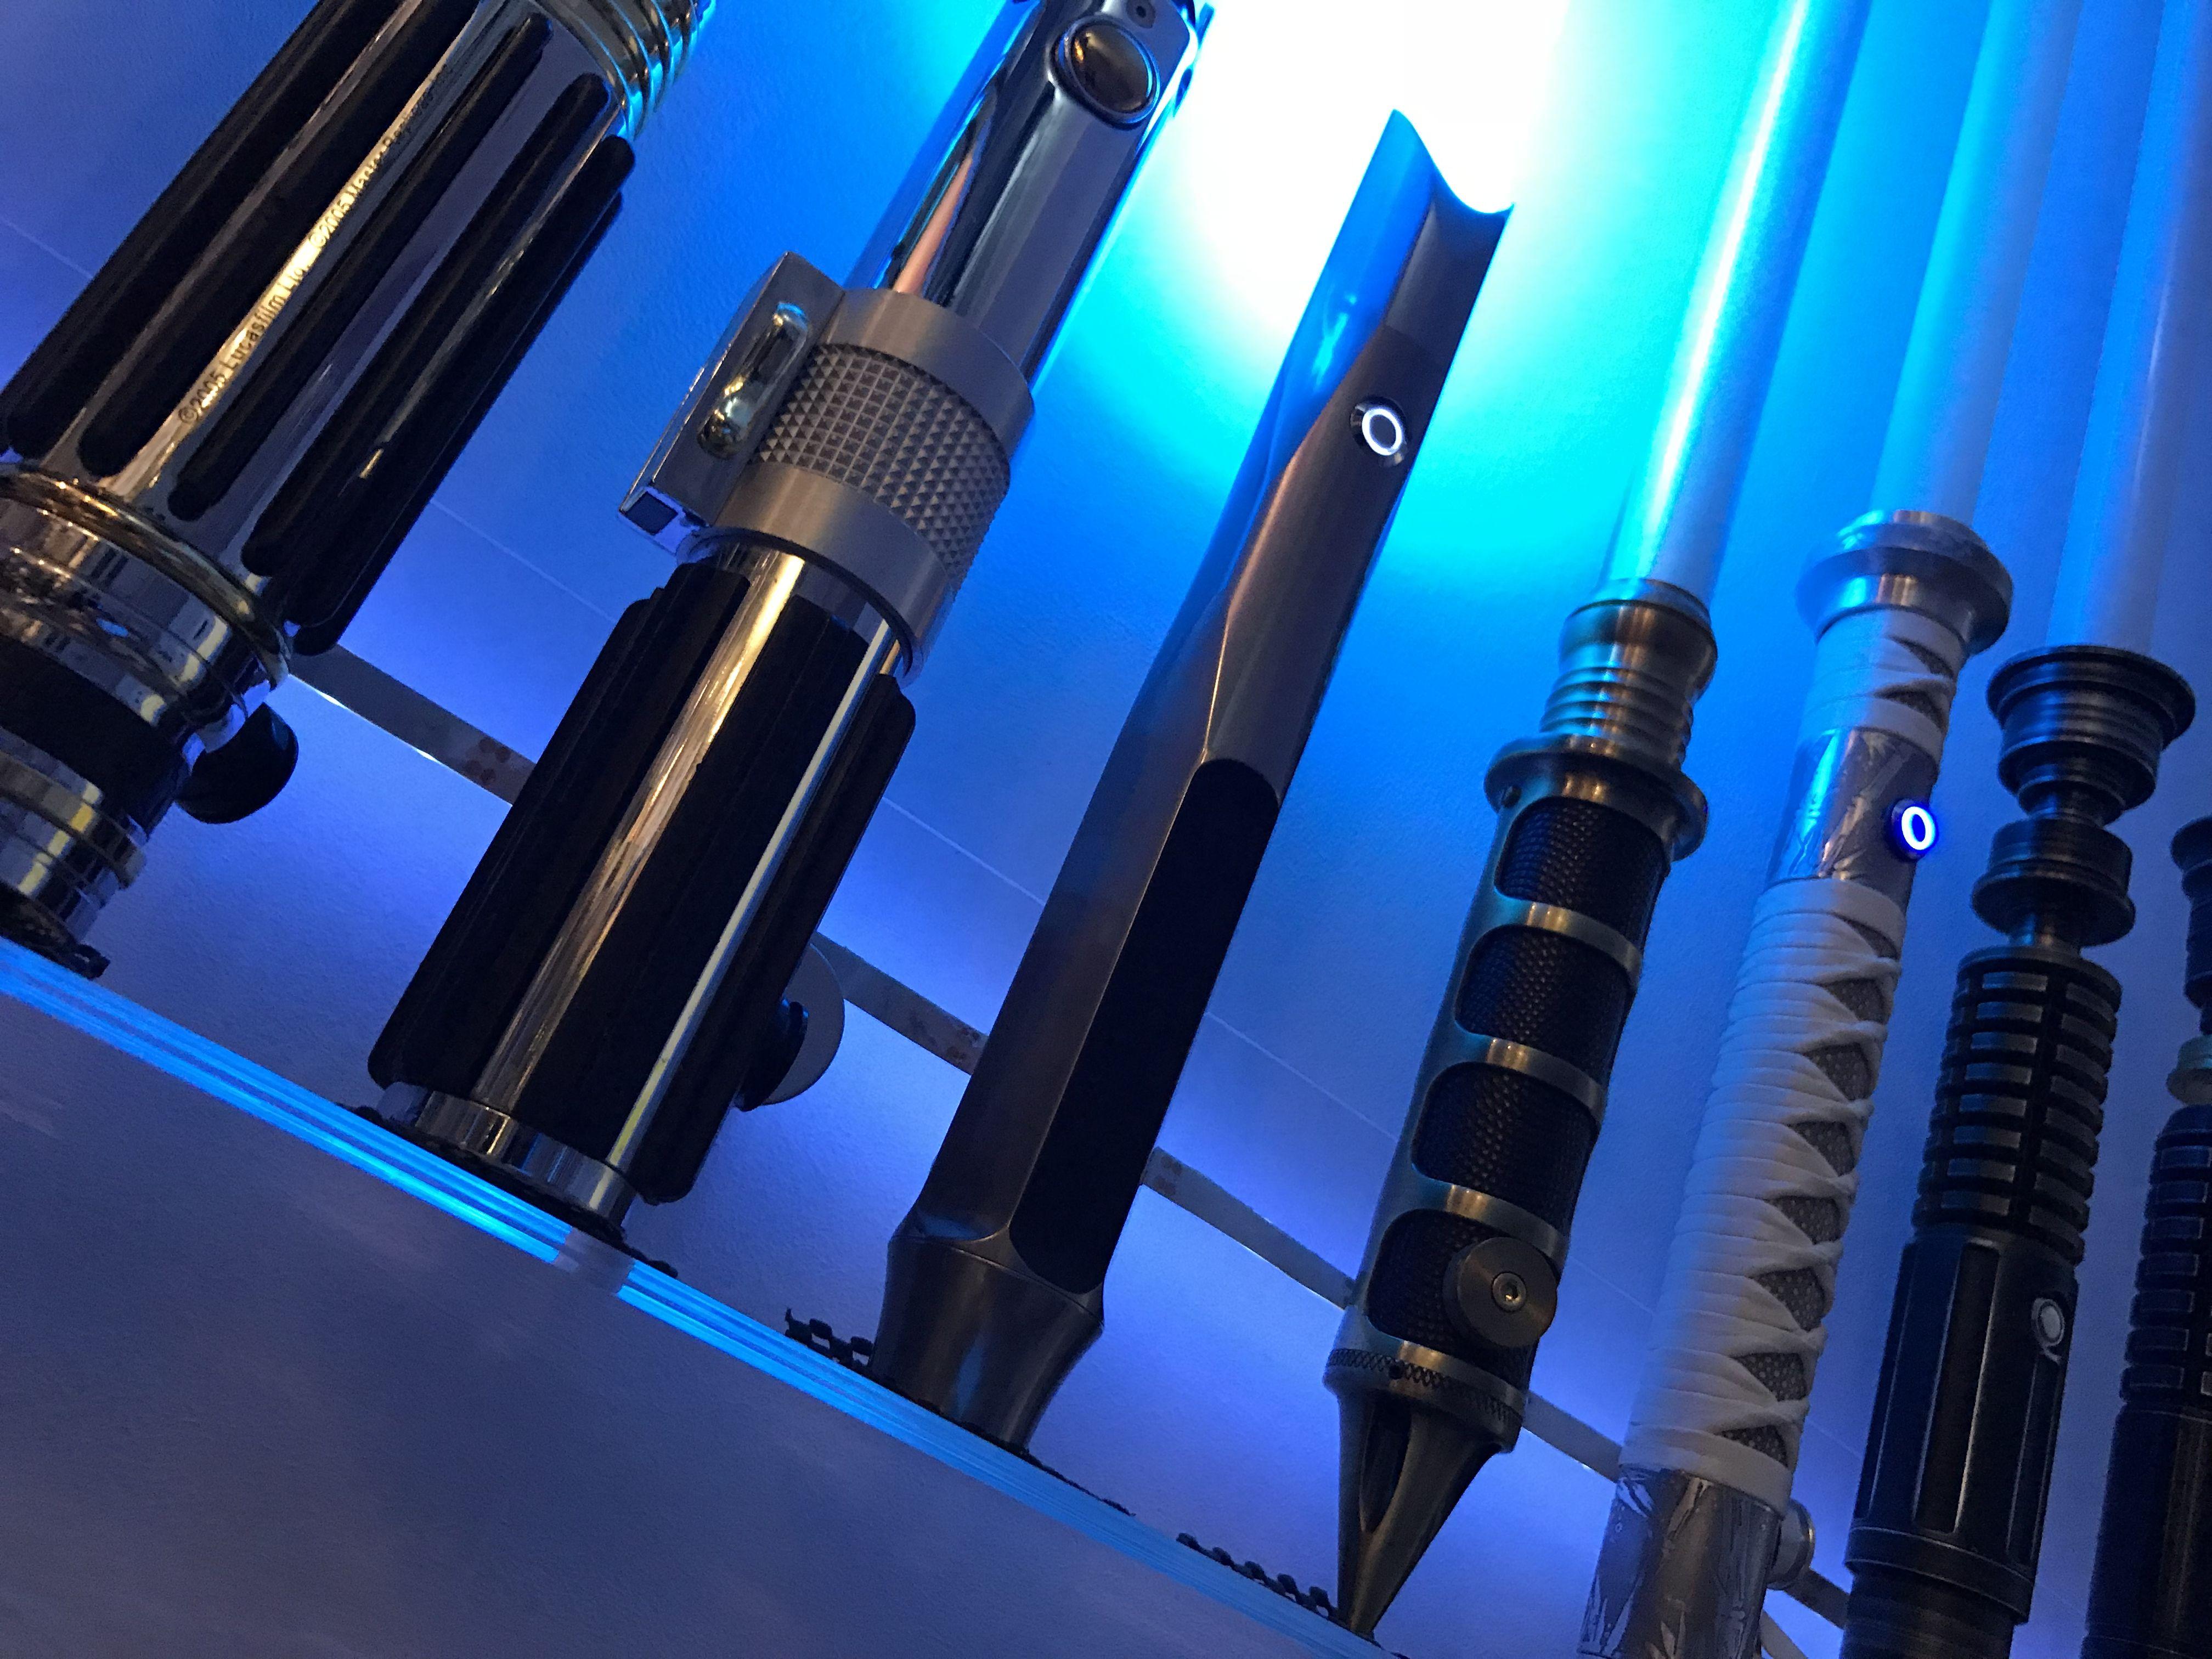 medium resolution of sabermach s dark storm part of the dantube lightsaber collection